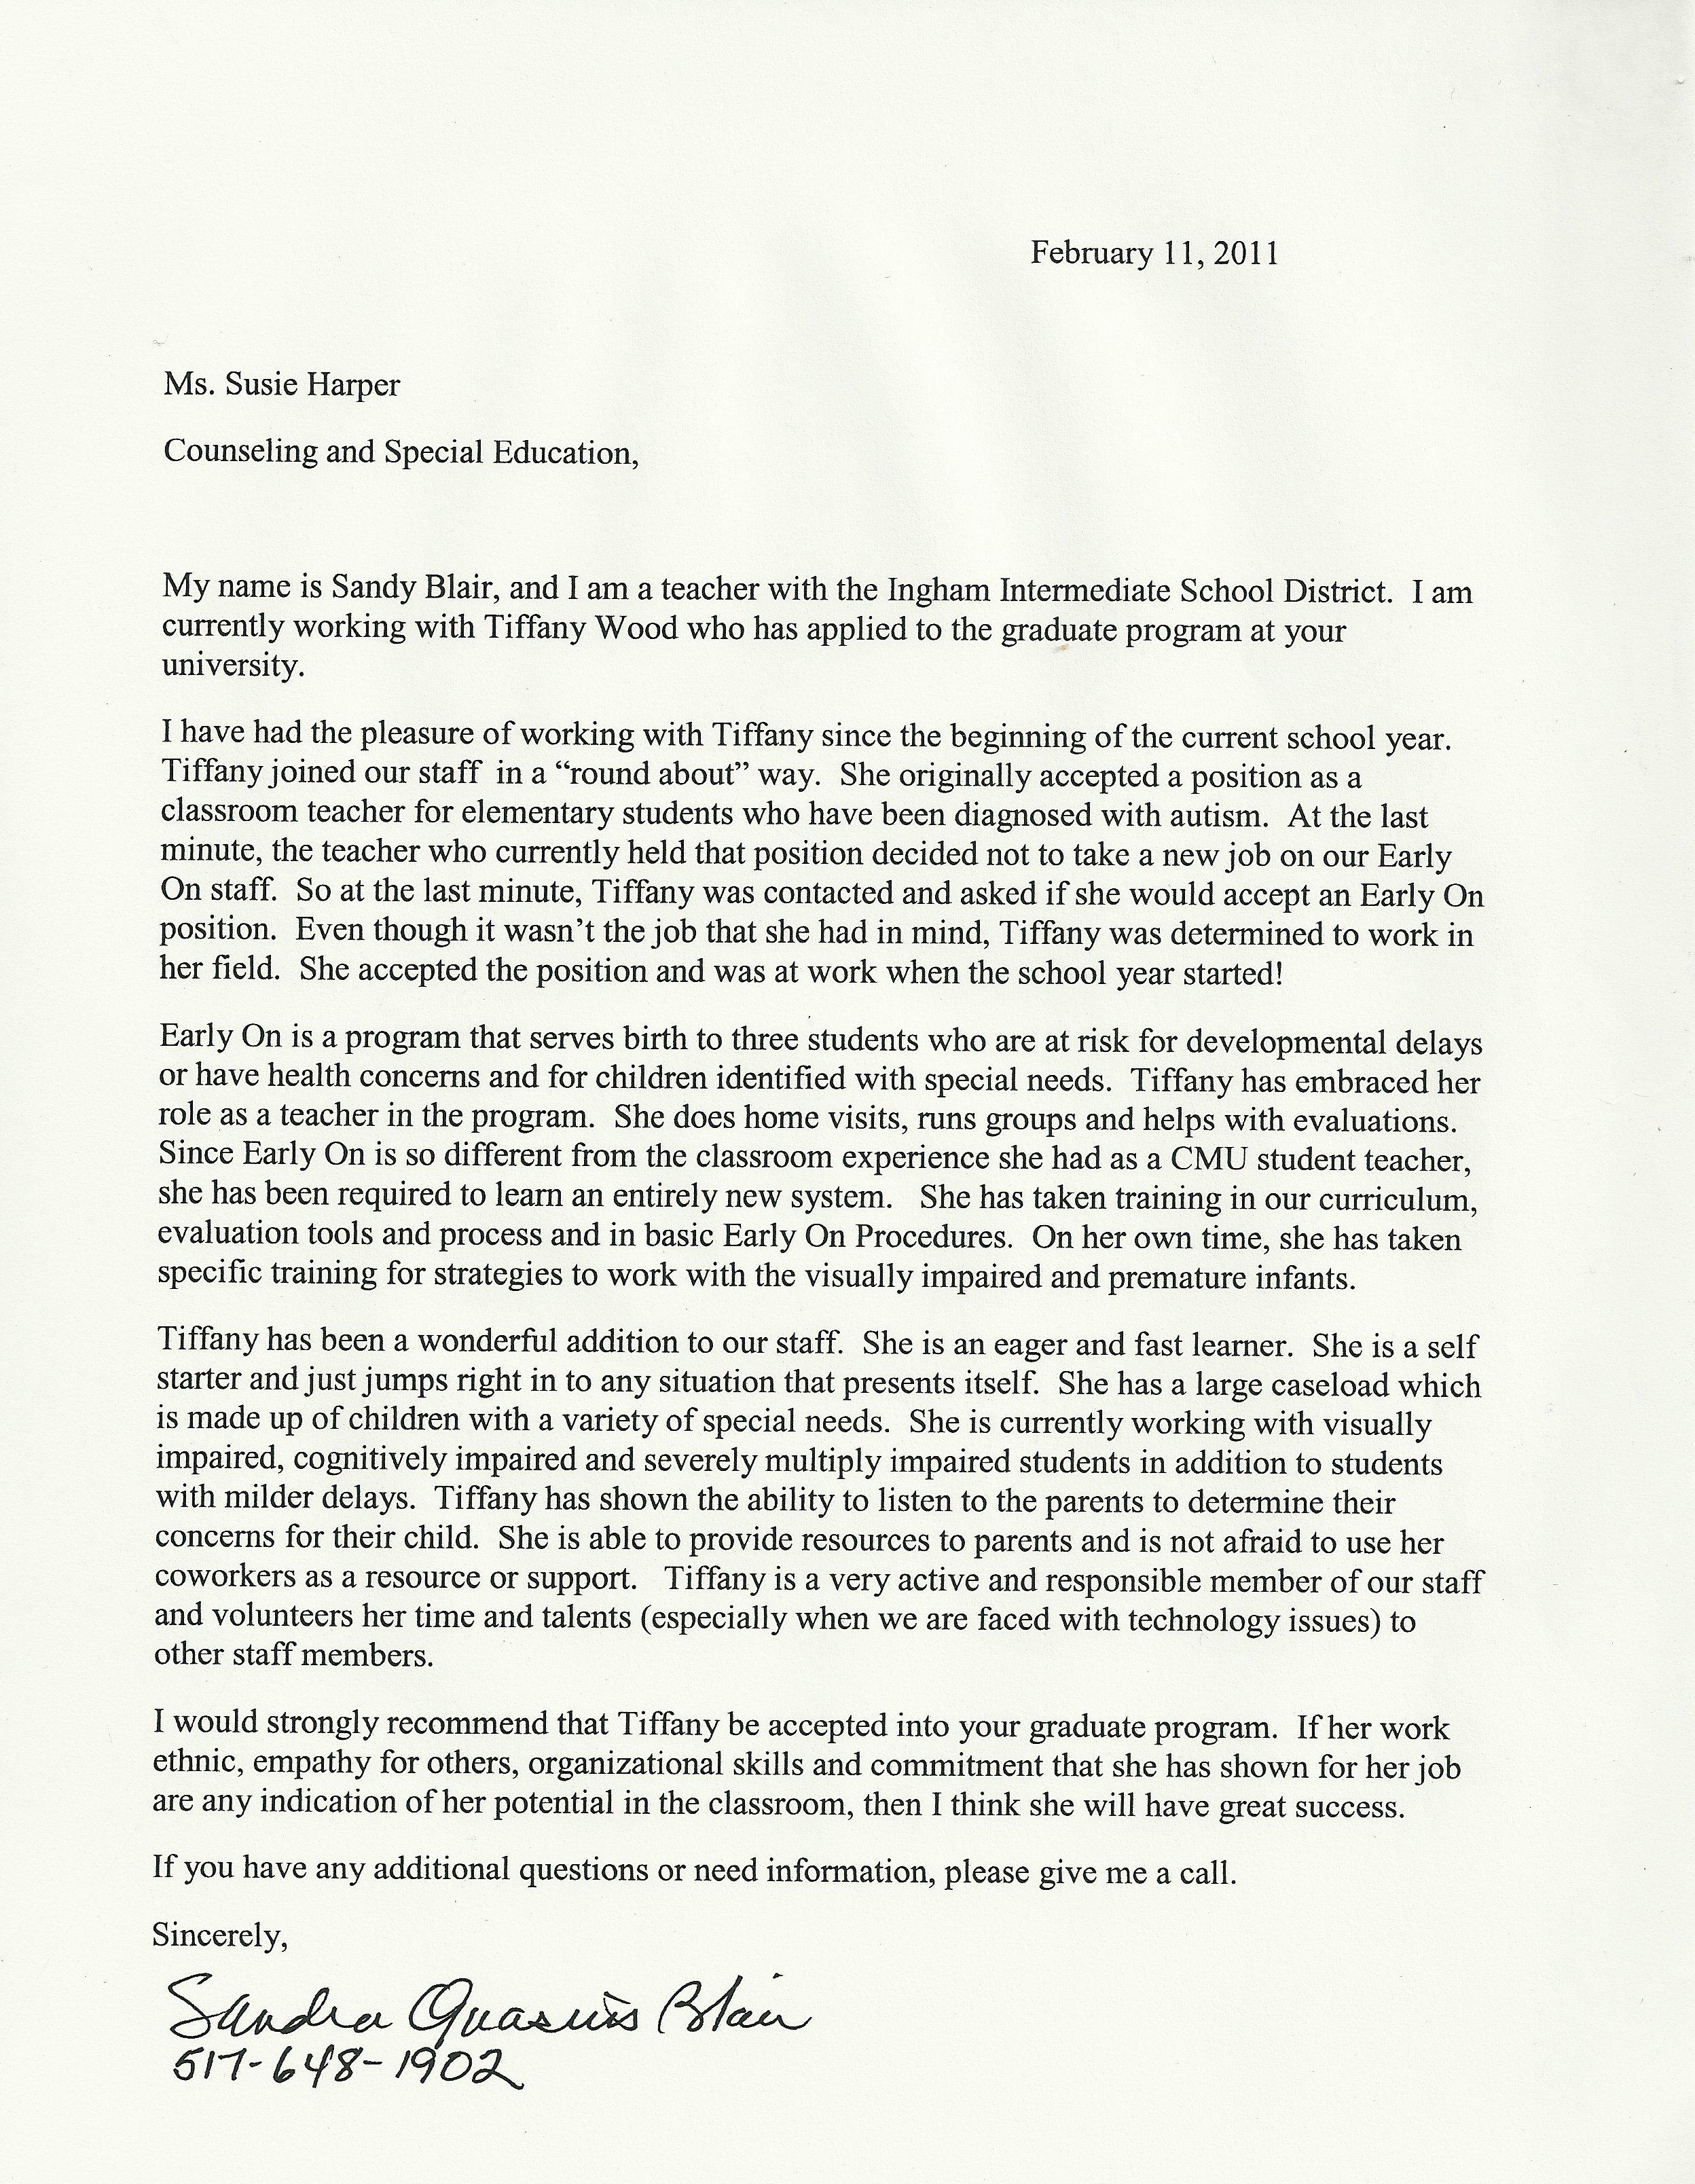 resume letter parts resume letter of interest template job offer